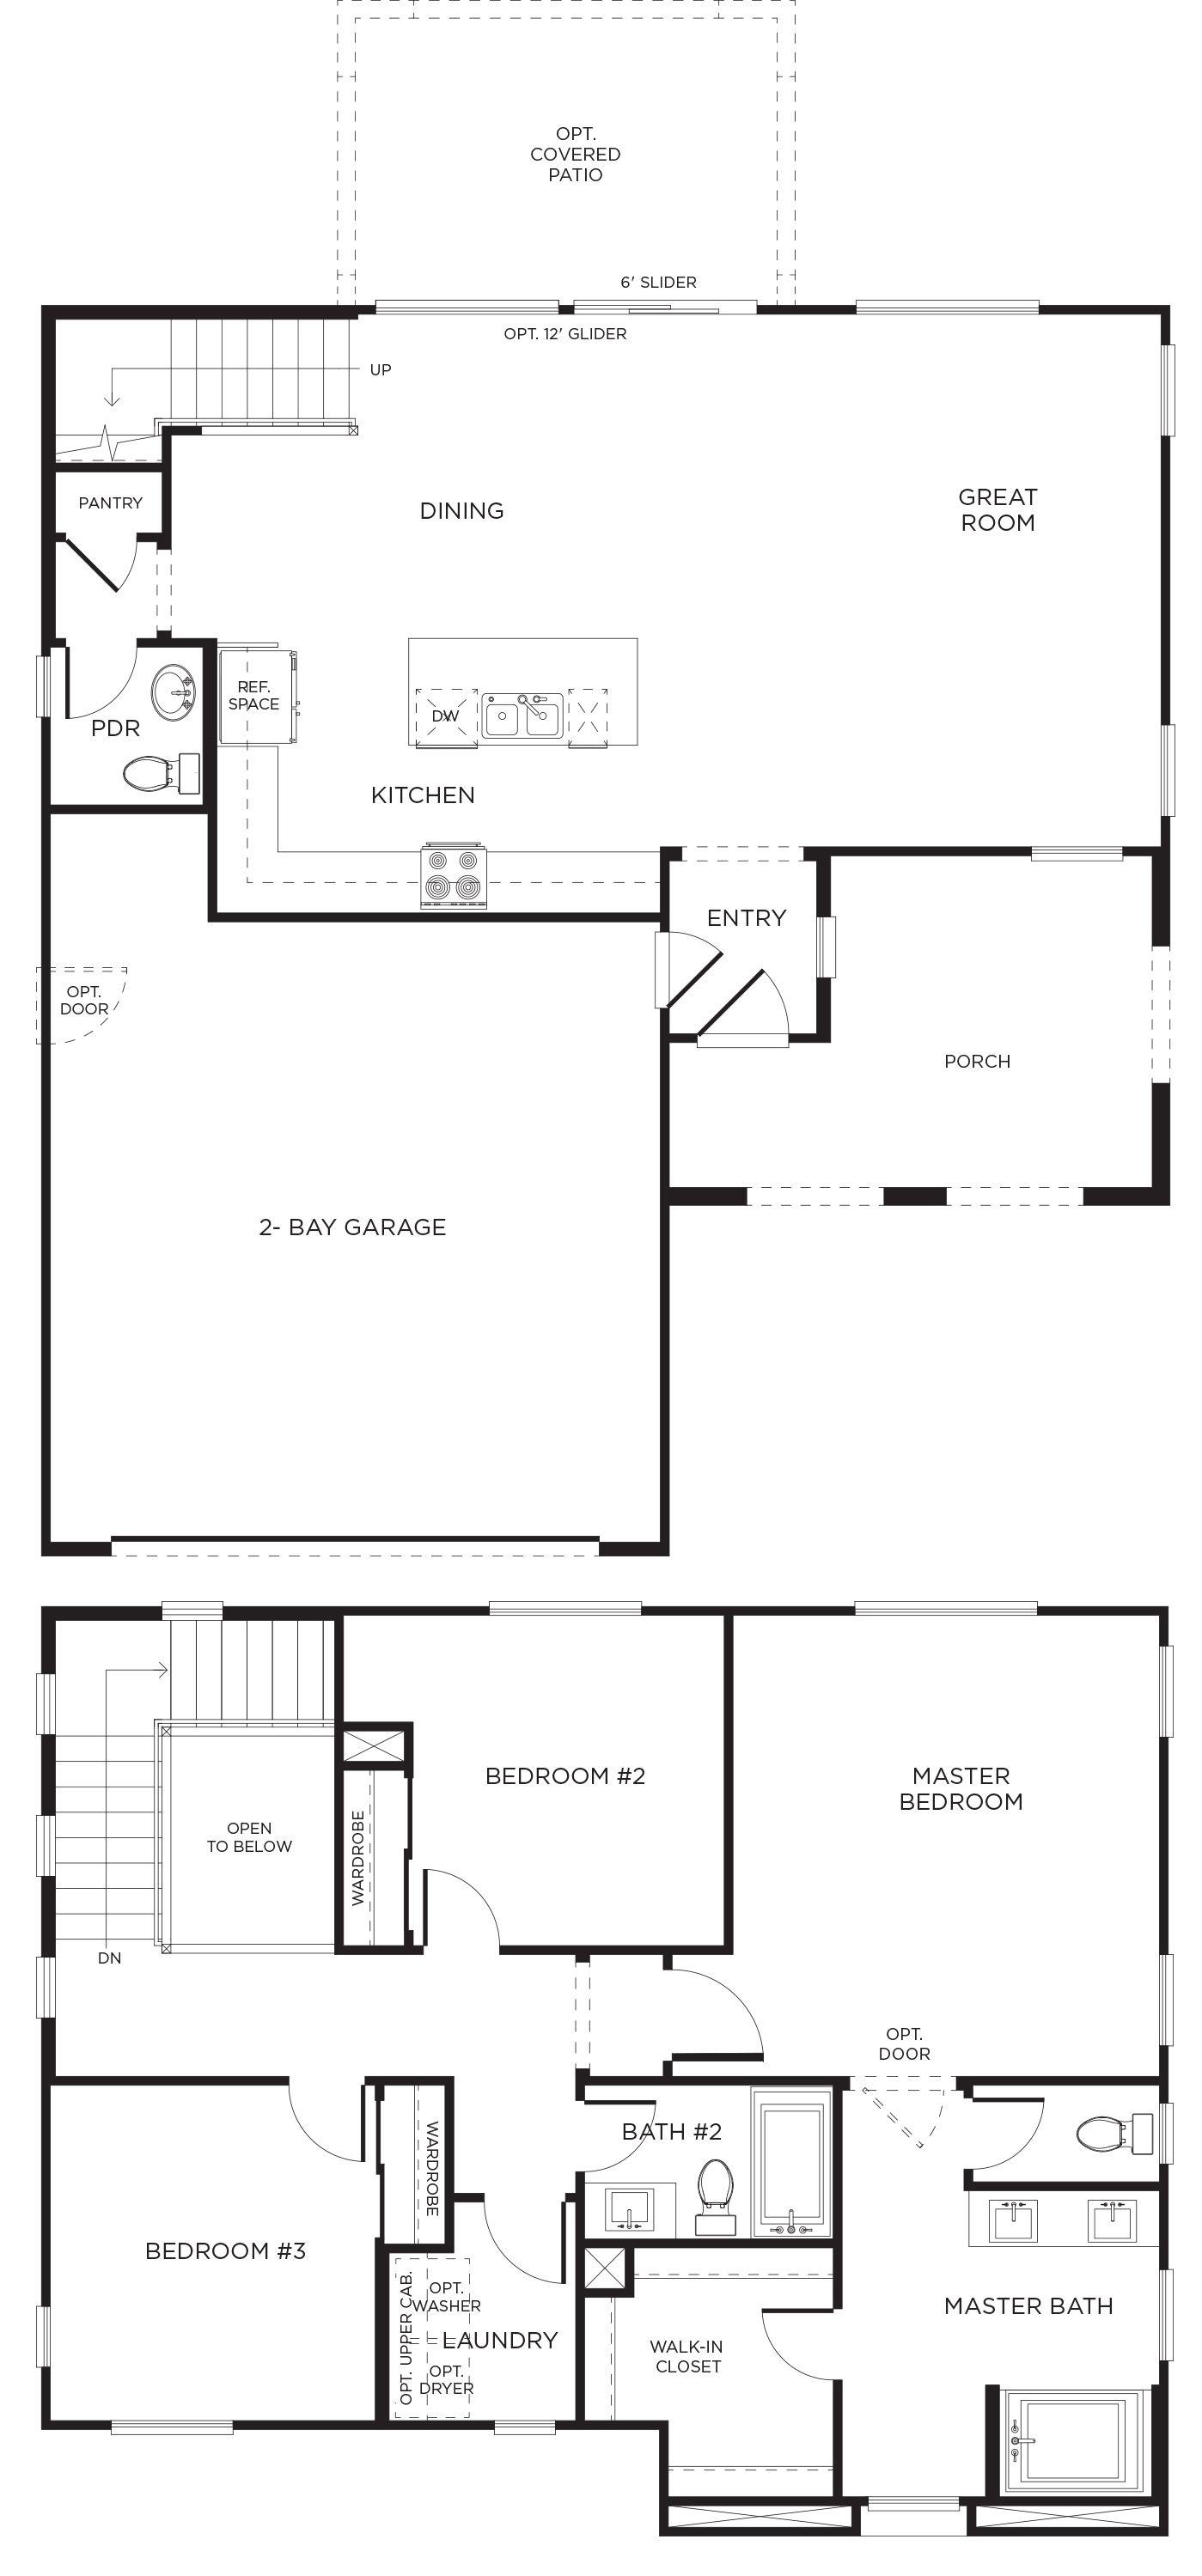 Real Estate In Beaumont Ca Elara Neighborhood Sundance Community Pardee Homes Floor Plans Garage Bedroom